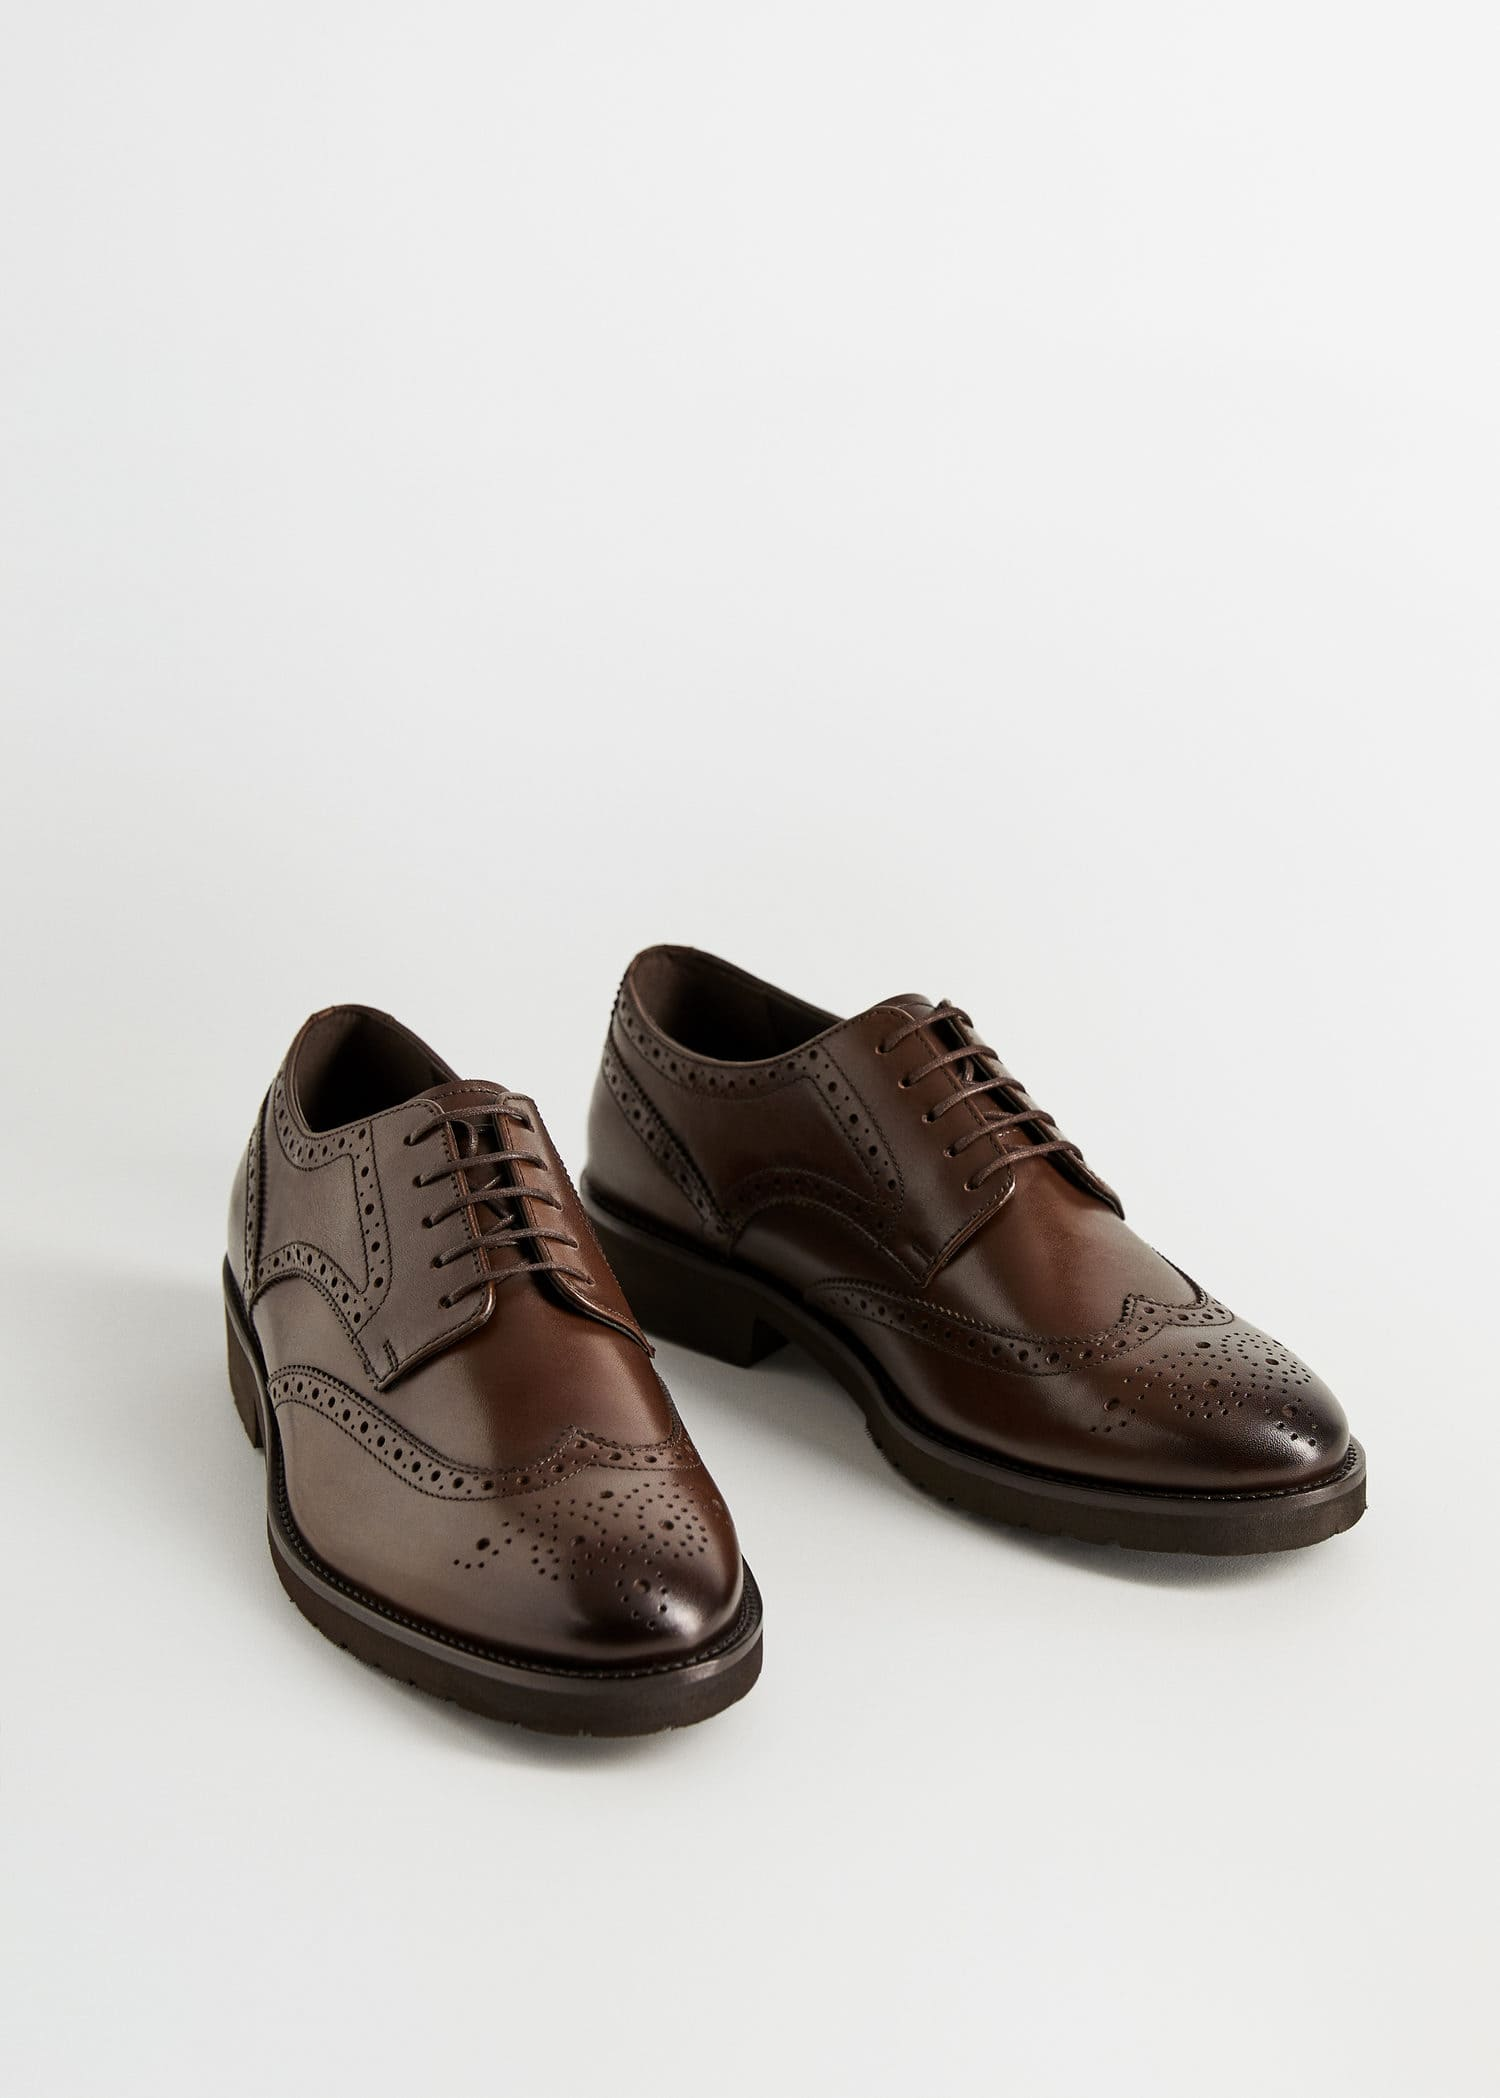 Cipők for Férfi 2020 | Mango Man Magyarország